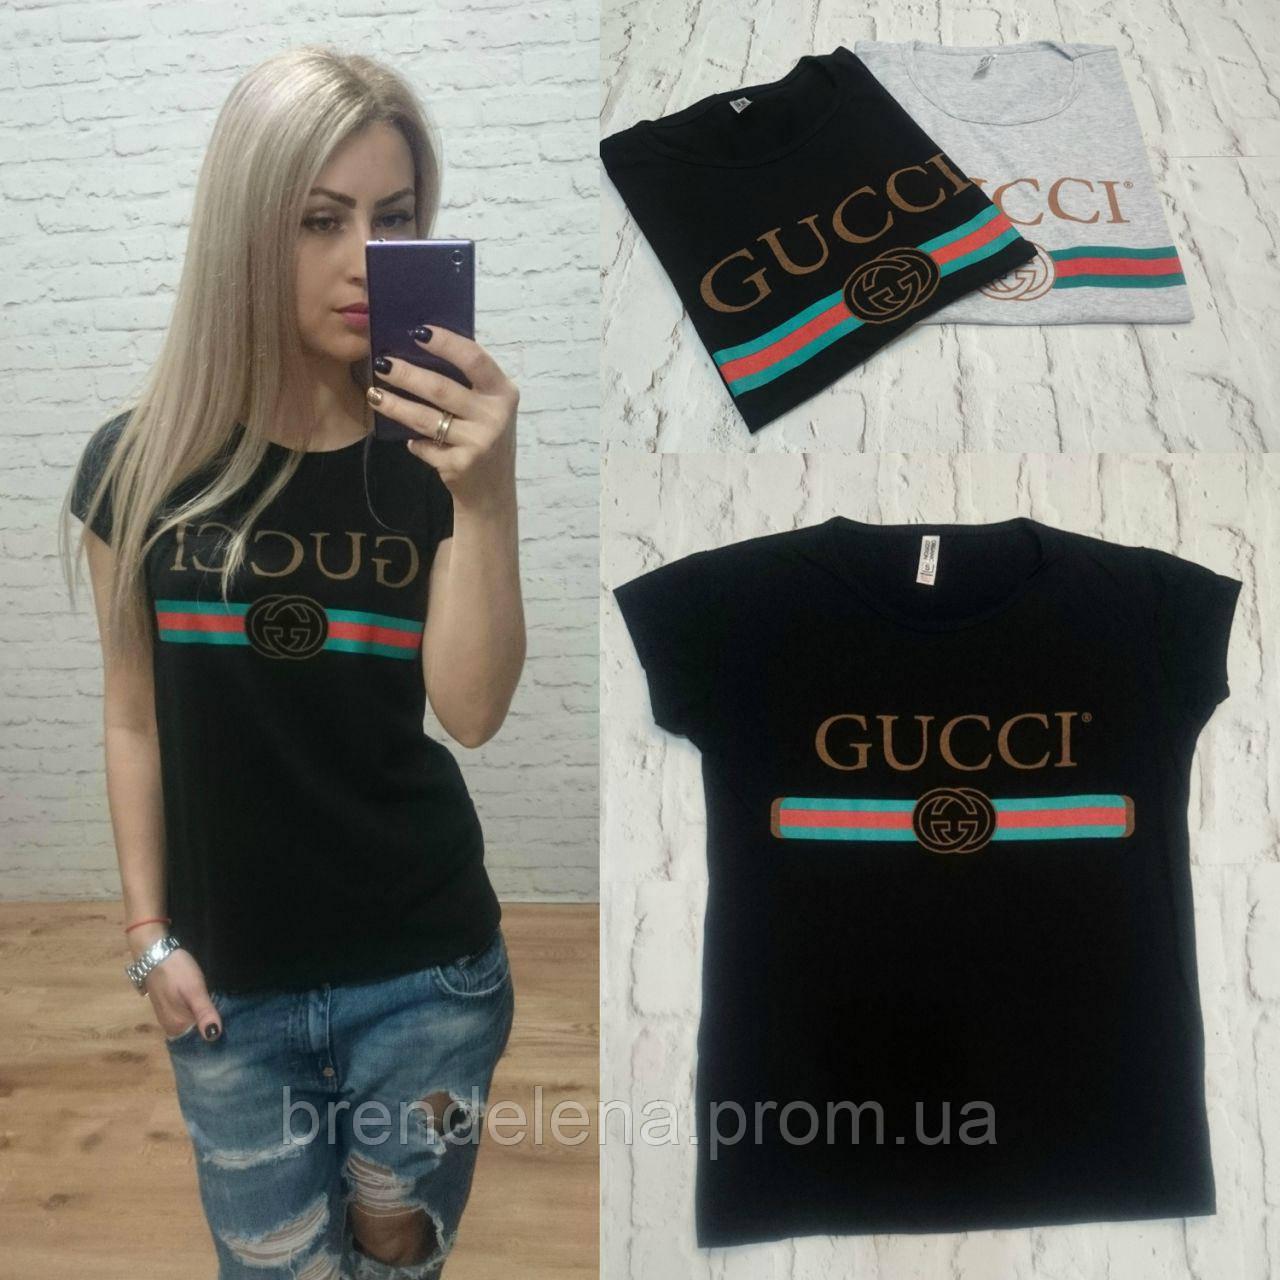 Молодіжна стильна футболка GUCCI р (44-46-48)